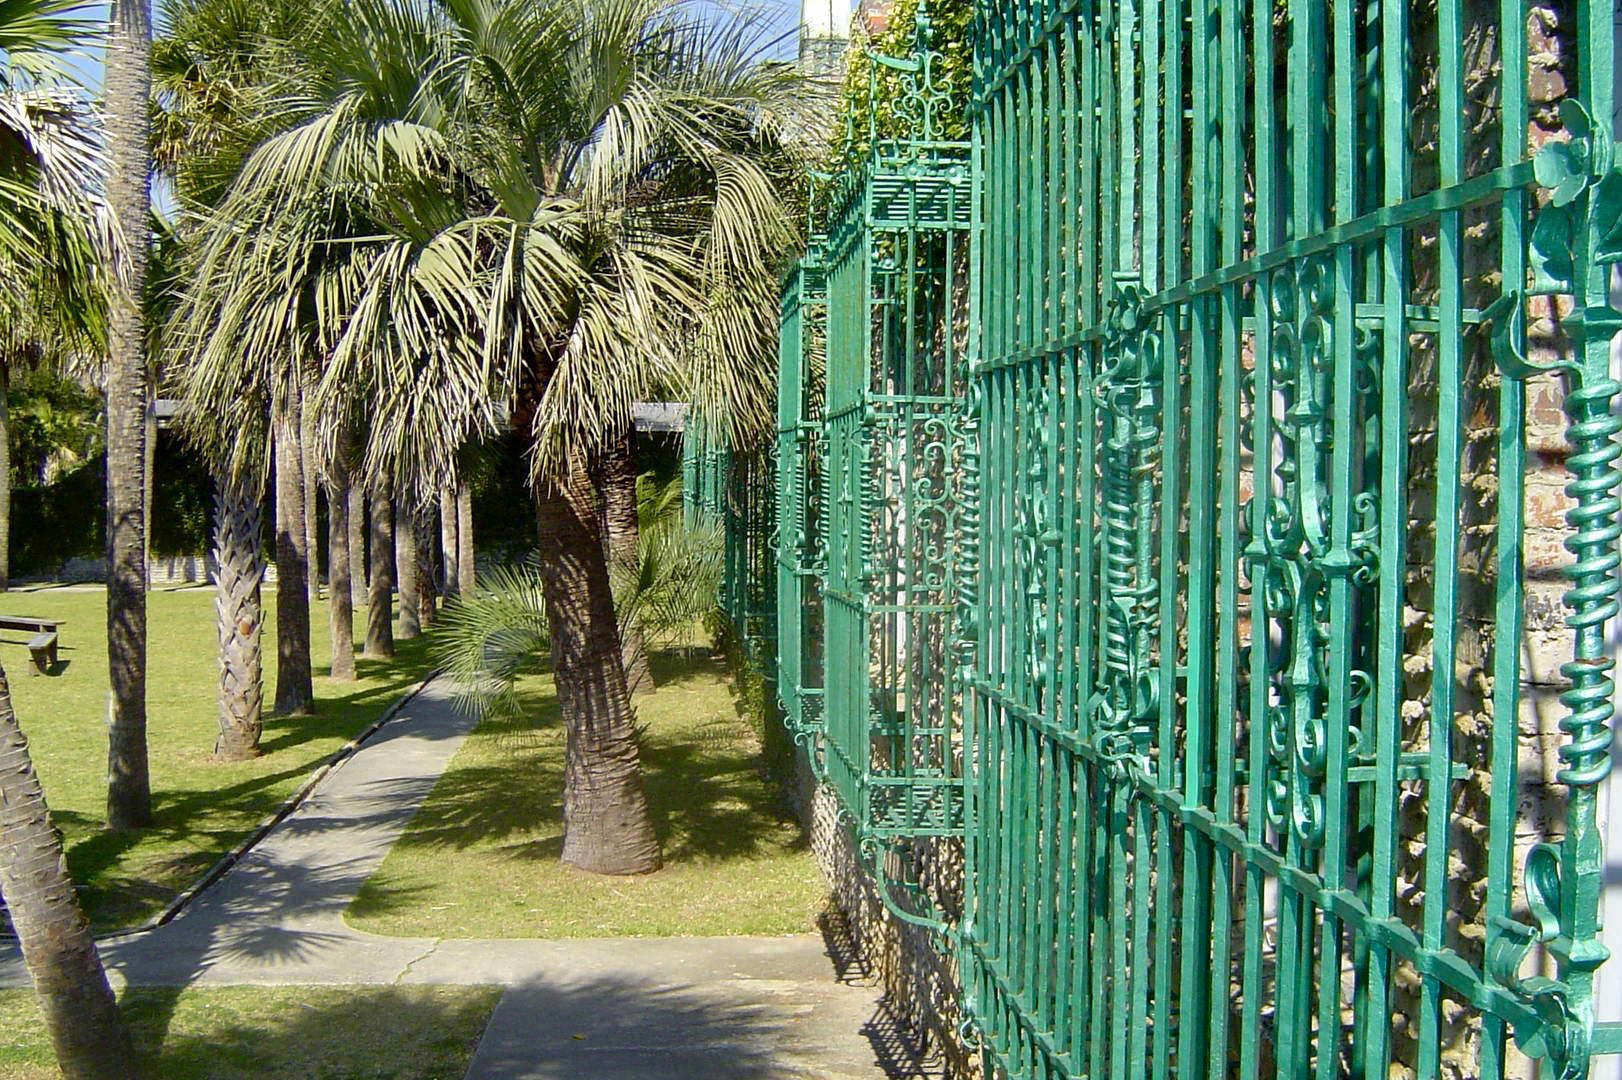 atalaya-green-window-bars-doug-coldwell-wikimedia